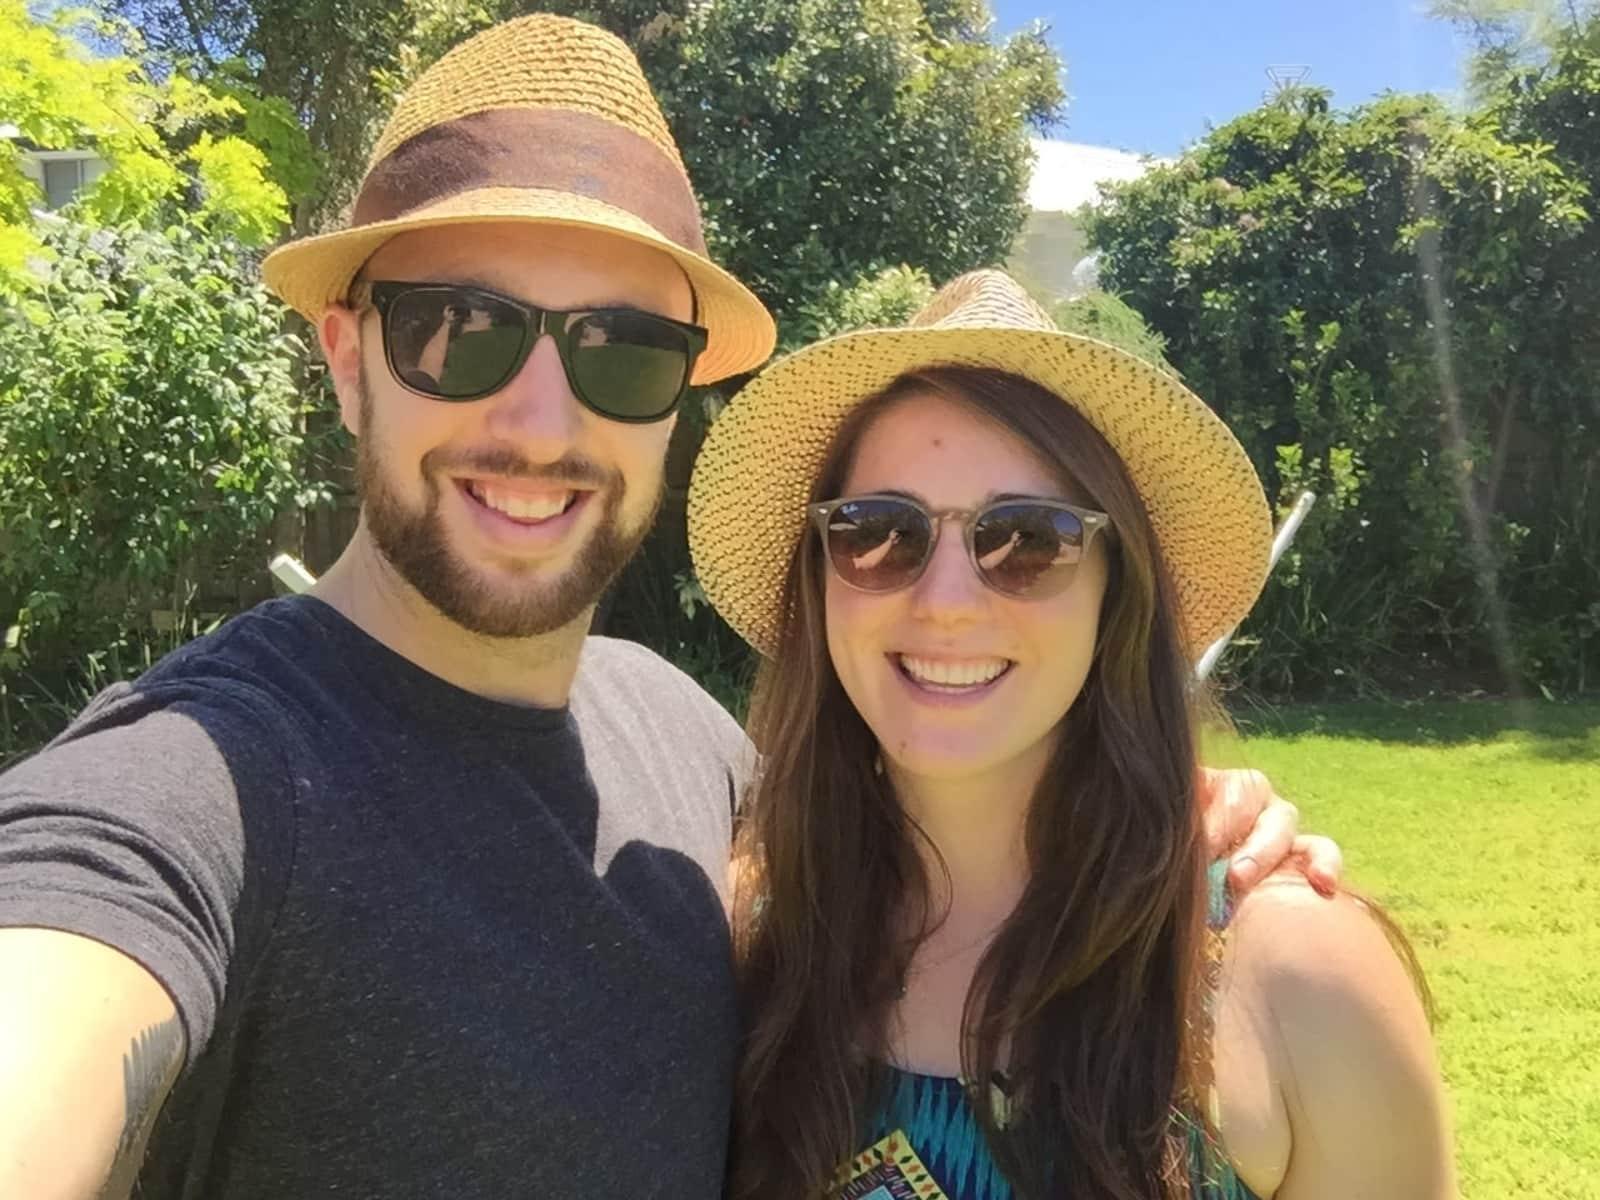 Ben & Julianne from Mount Maunganui, New Zealand